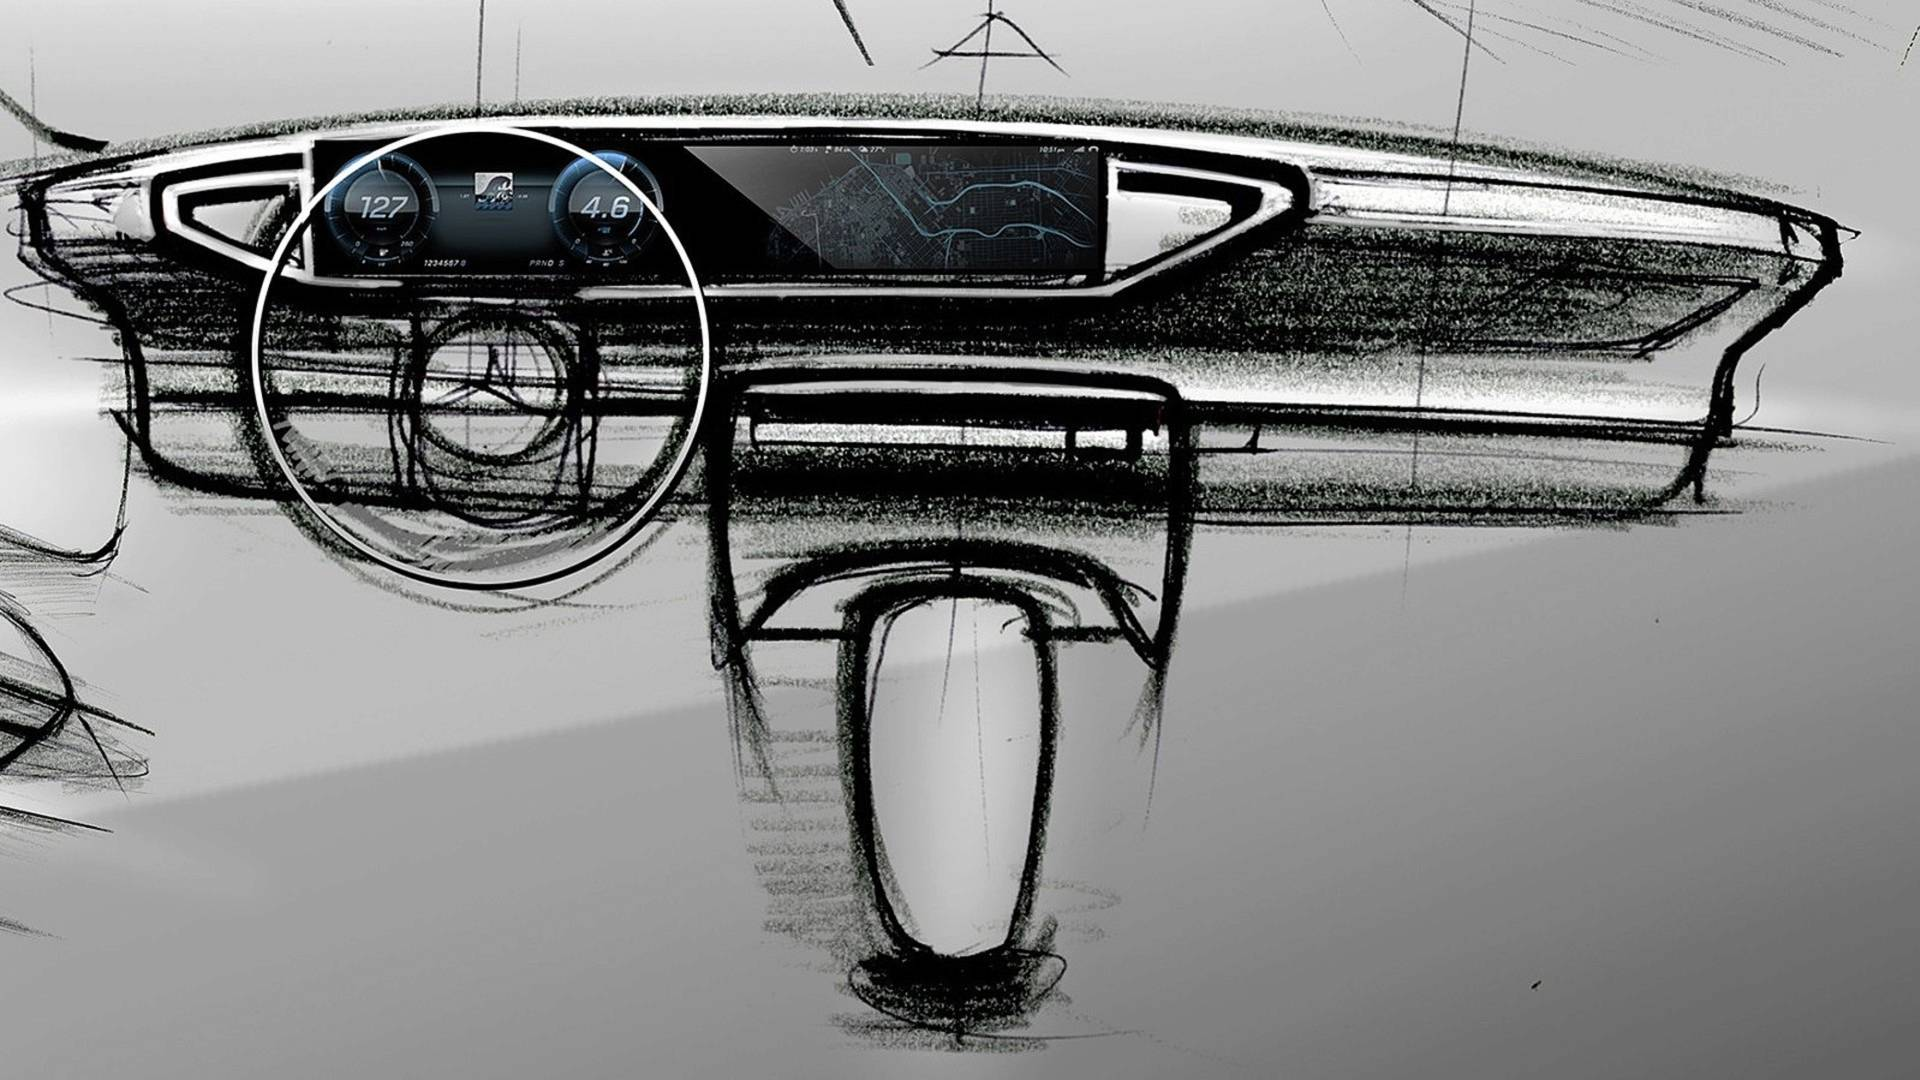 2019 Mercedes Benz Gle Interior Teased Widescreen Cockpit Confirmed